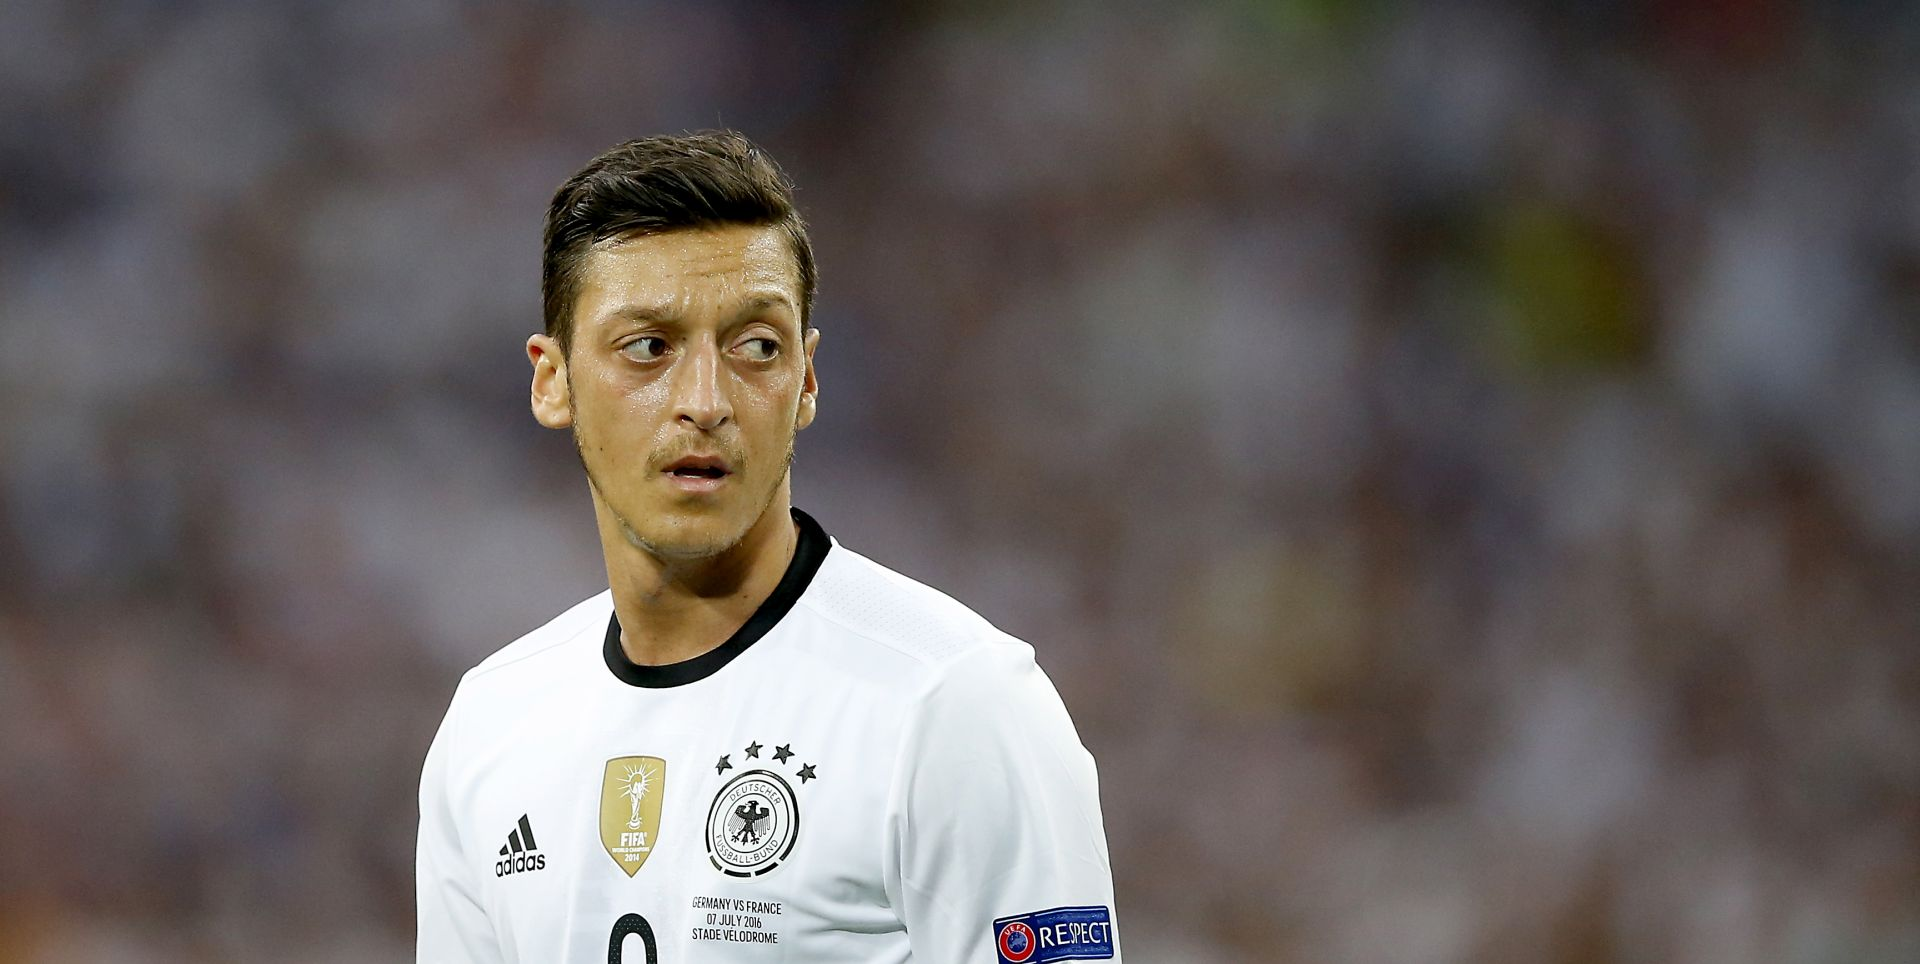 Kolašinac spasio Özila od kradljivaca automobila